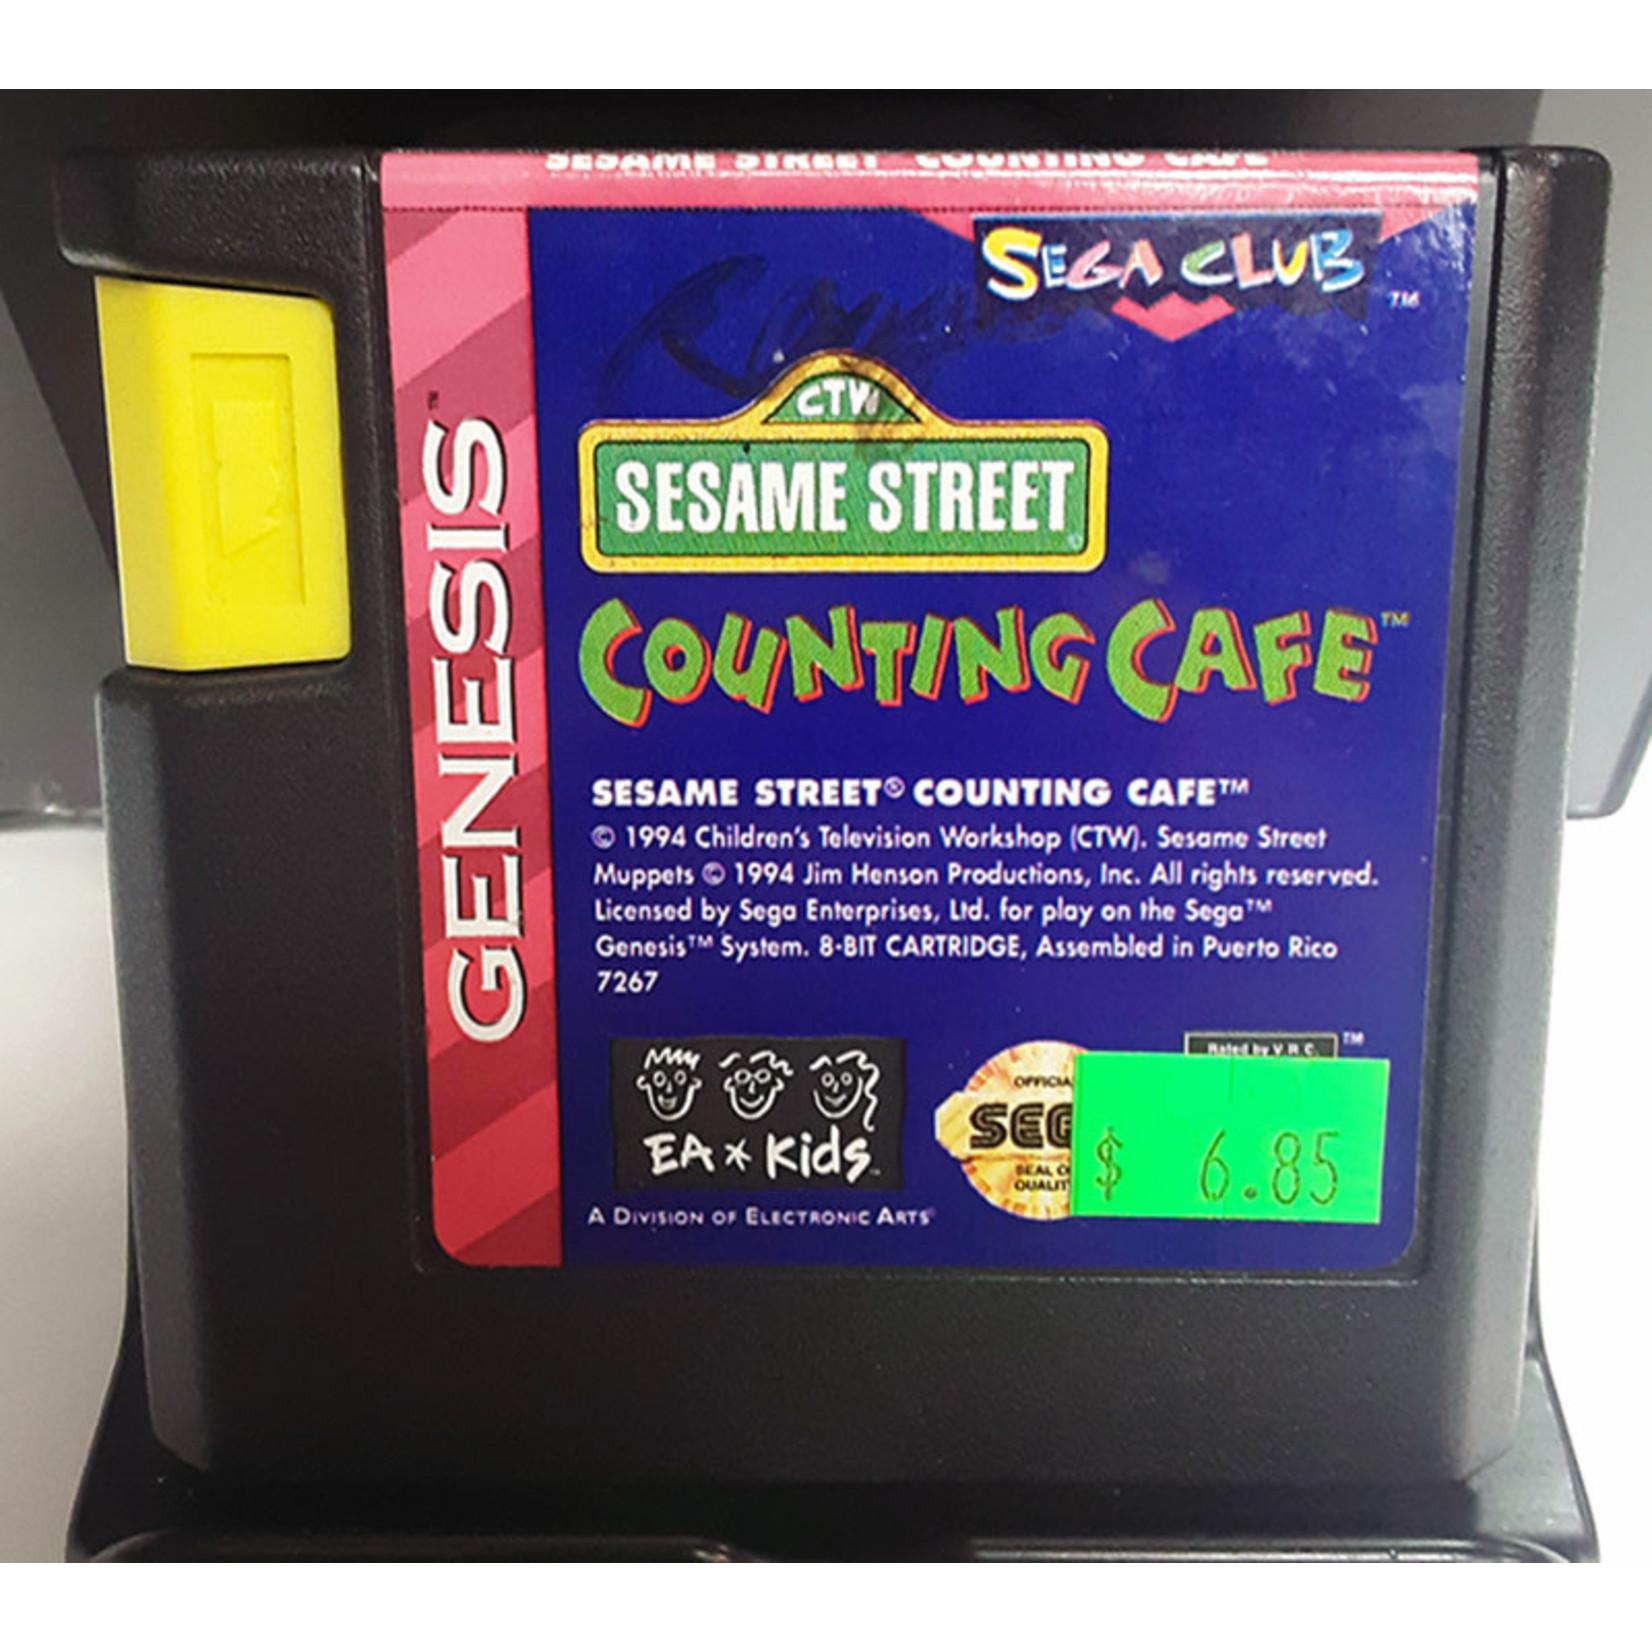 sgu-sesame street counting cafe (cartridge)